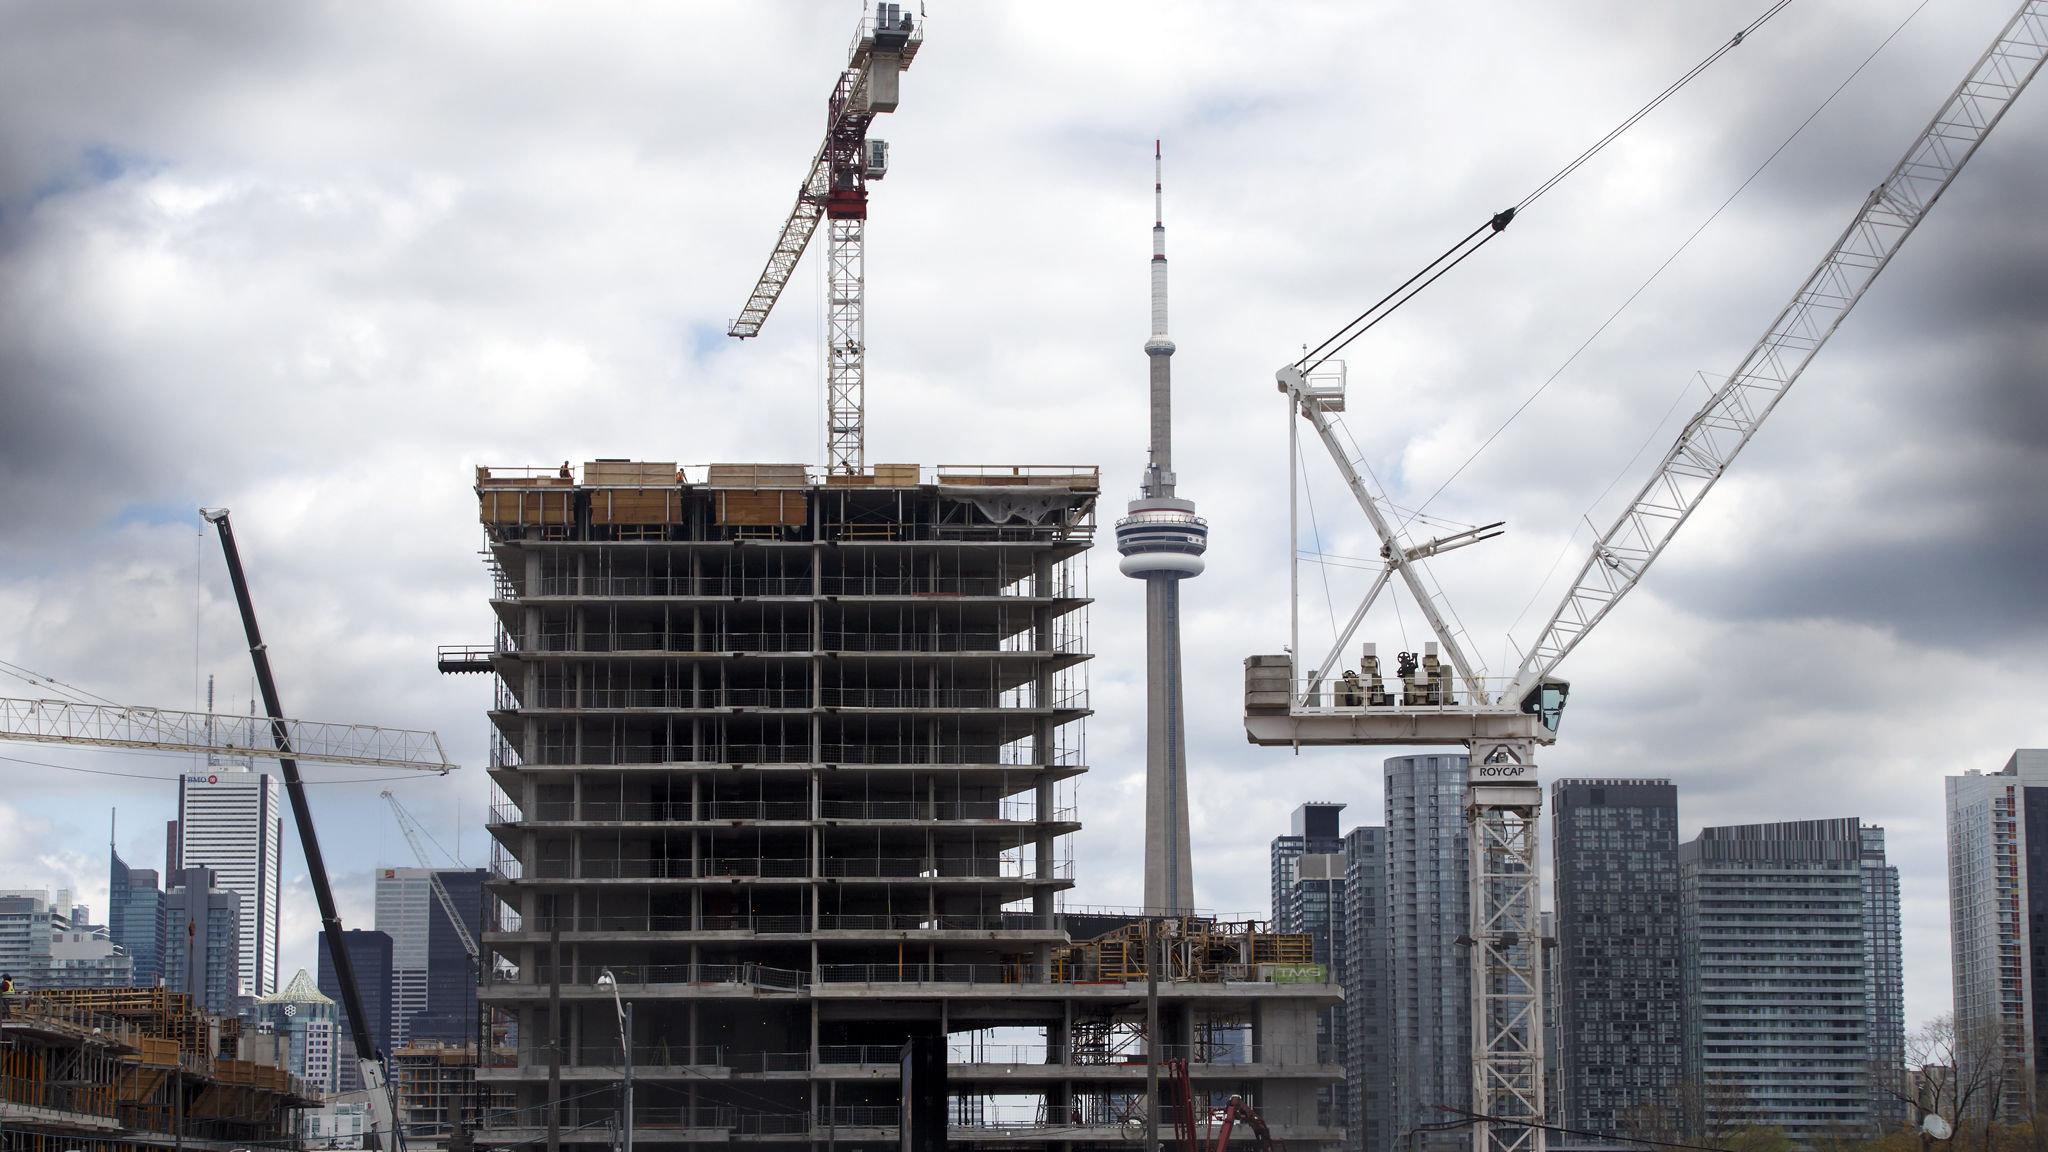 Canada S Housing Market Buzz Is Back As Toronto Rebounds Financial Times